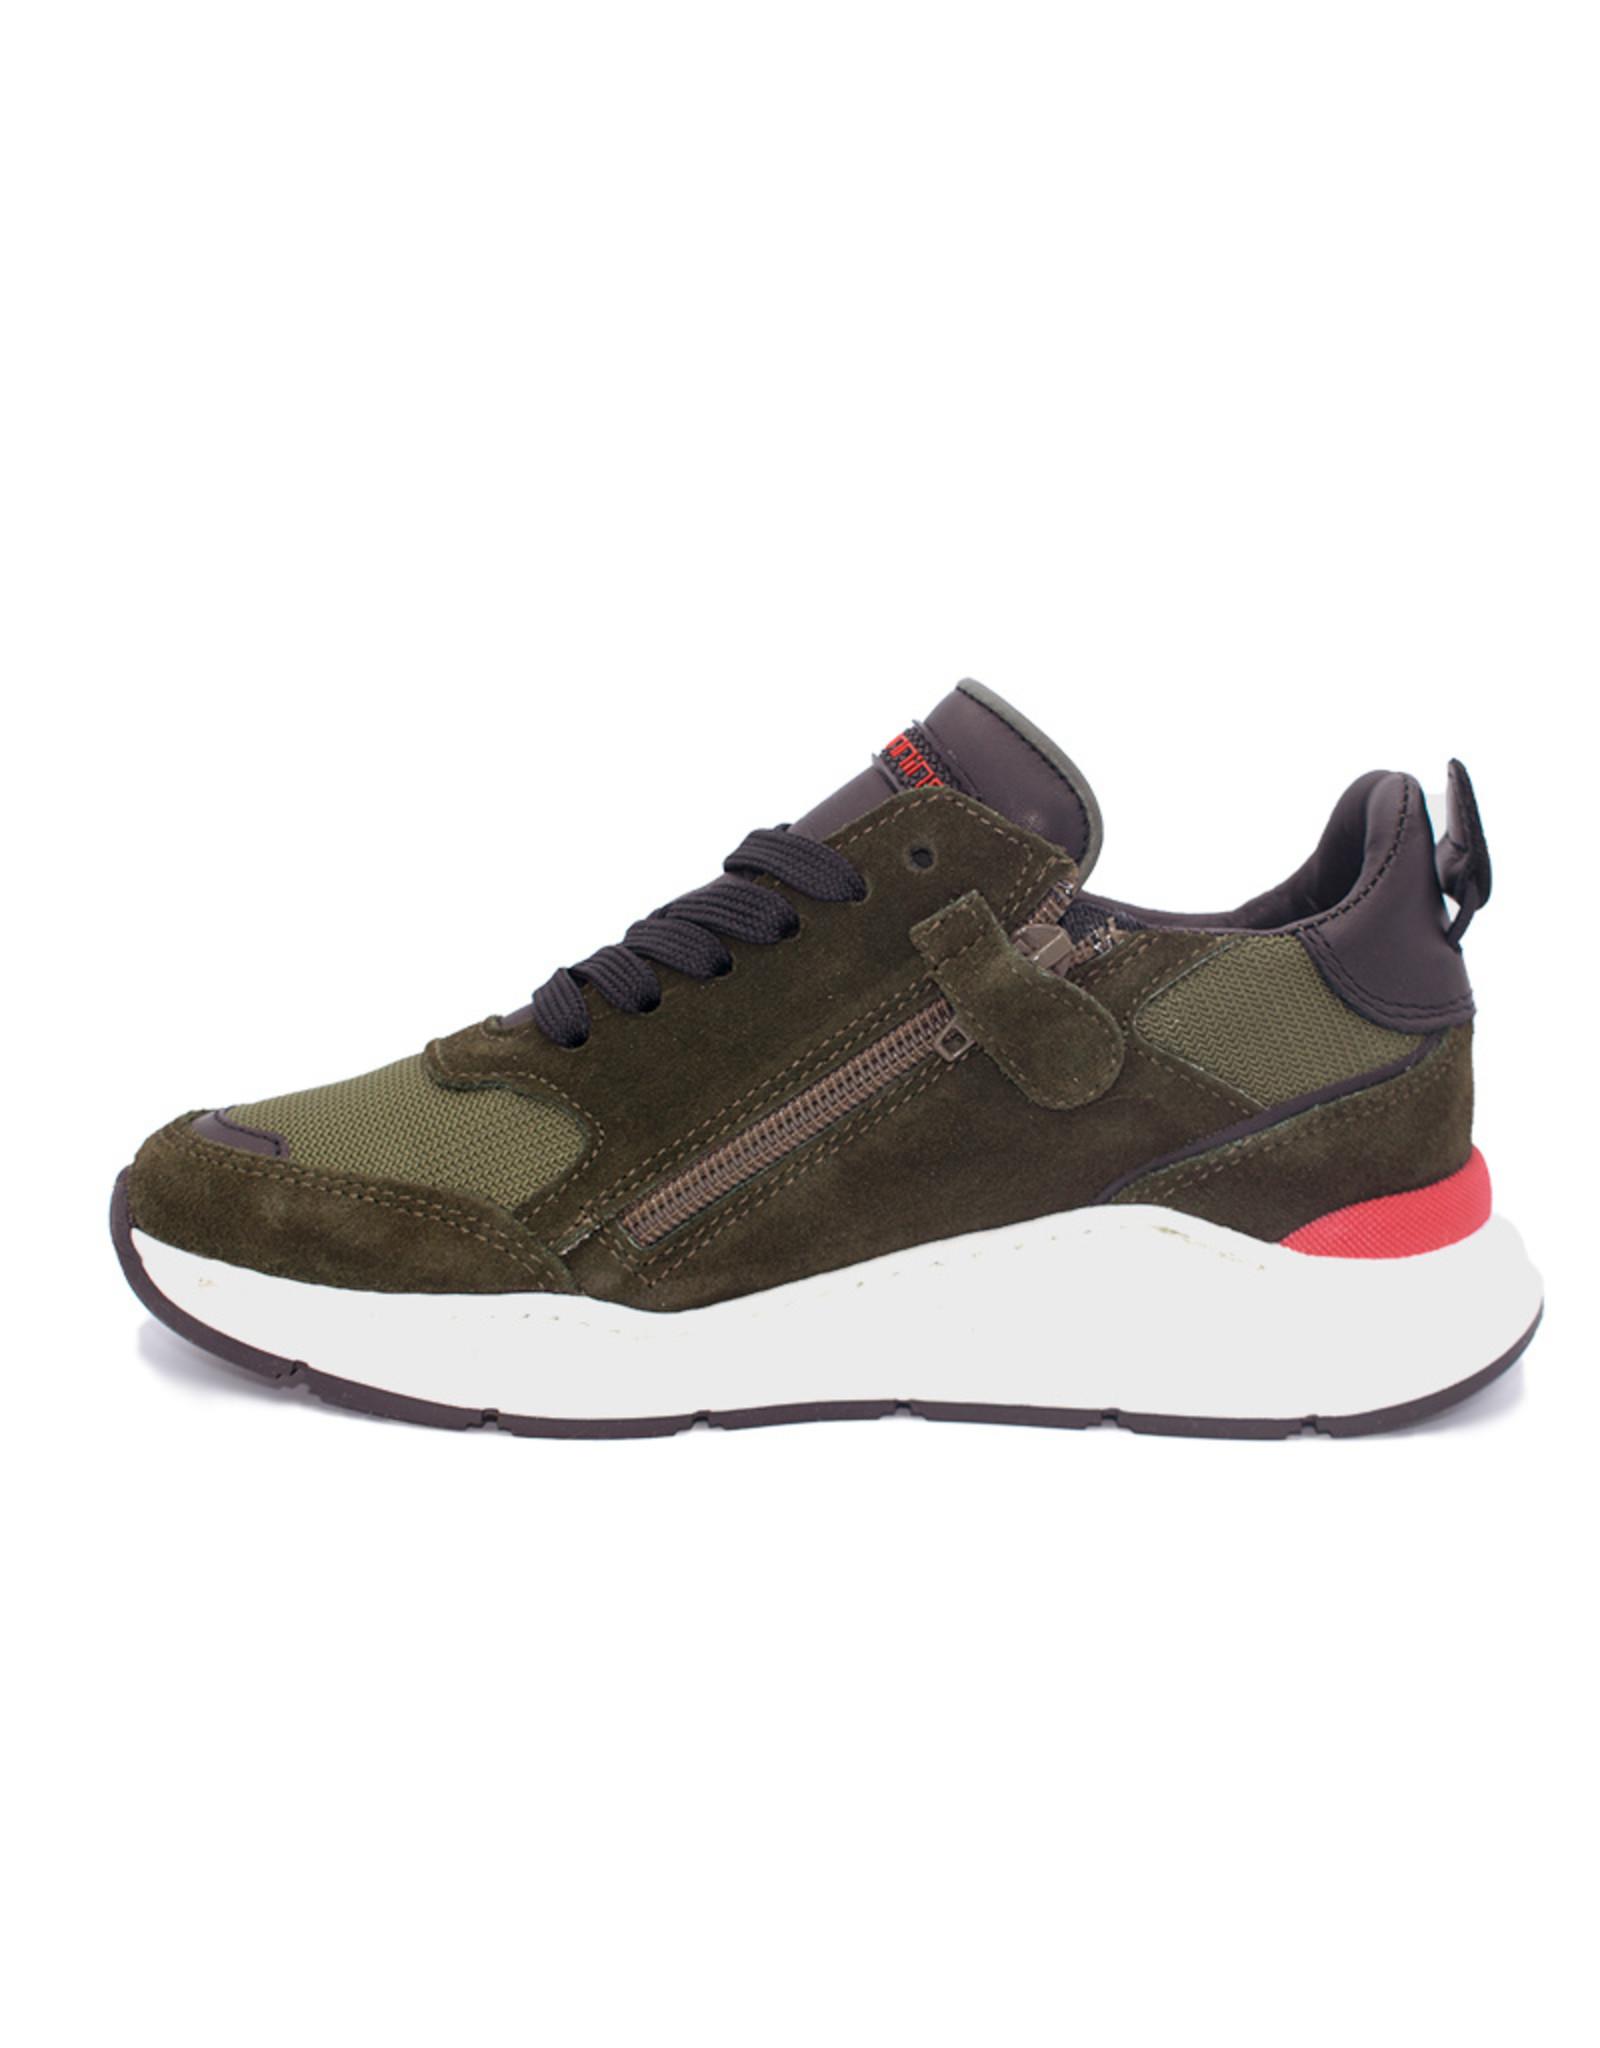 HIP HIP sneaker runner groen fluo